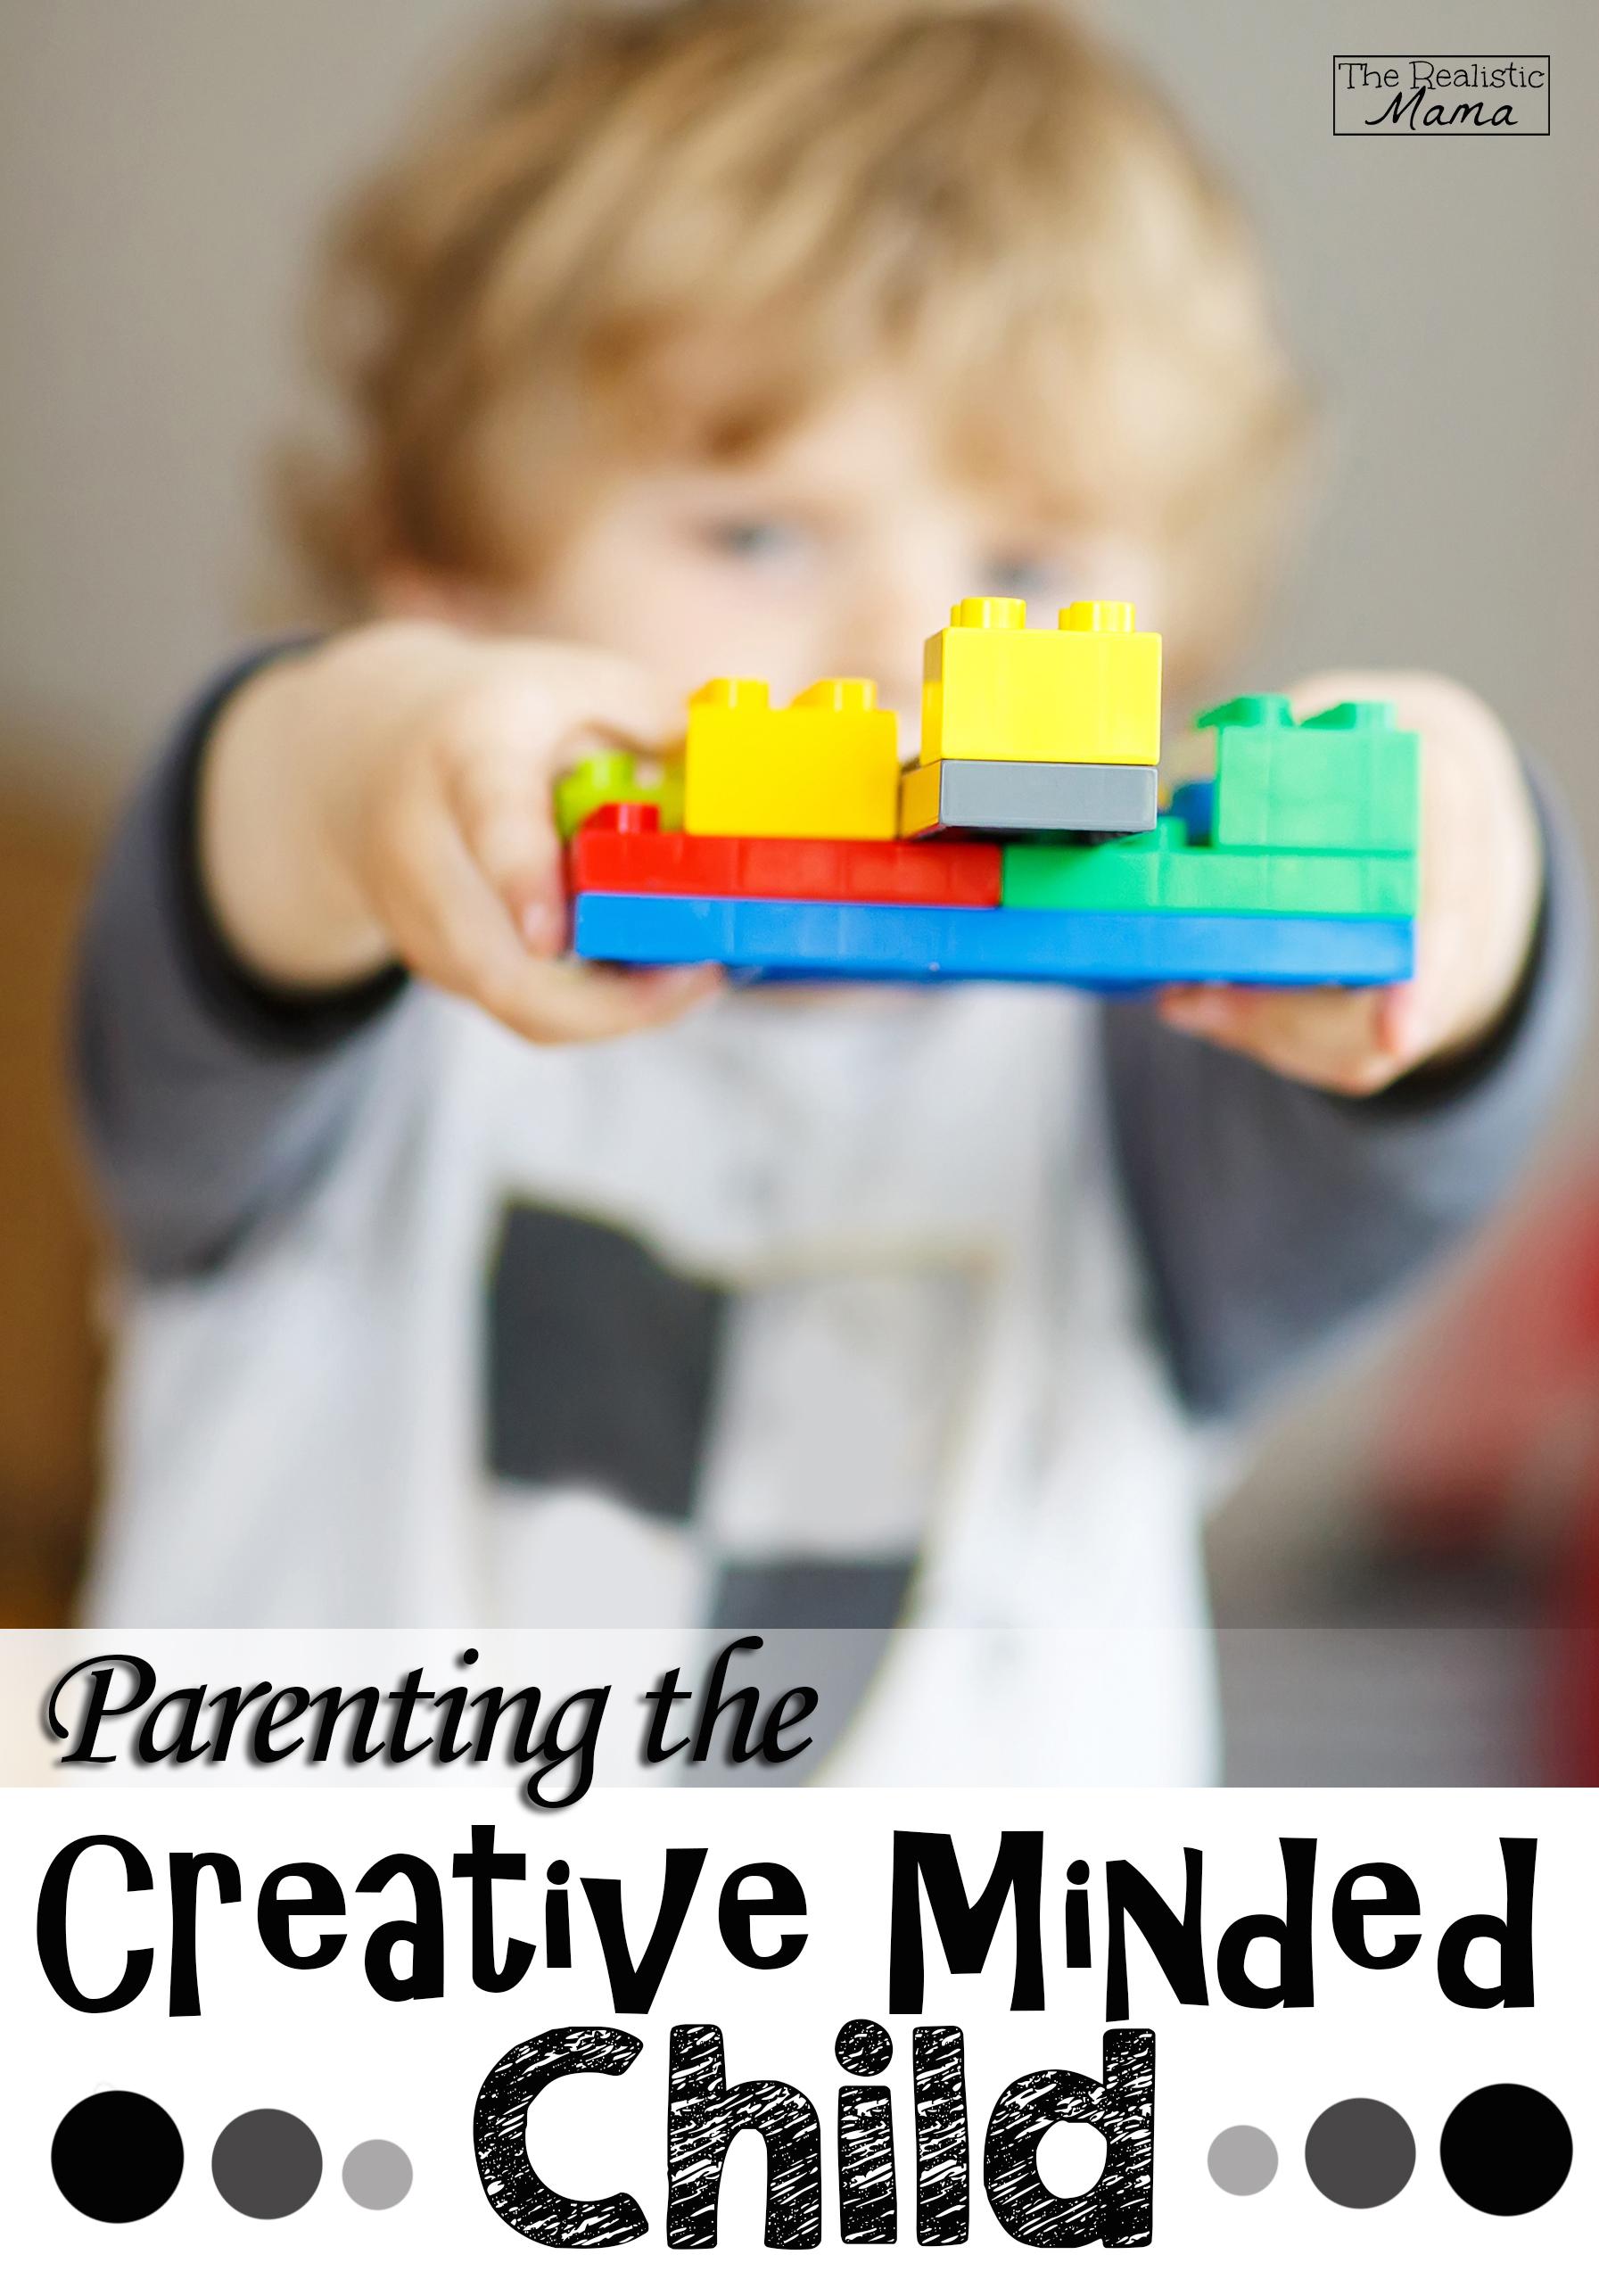 Creative Minded Child